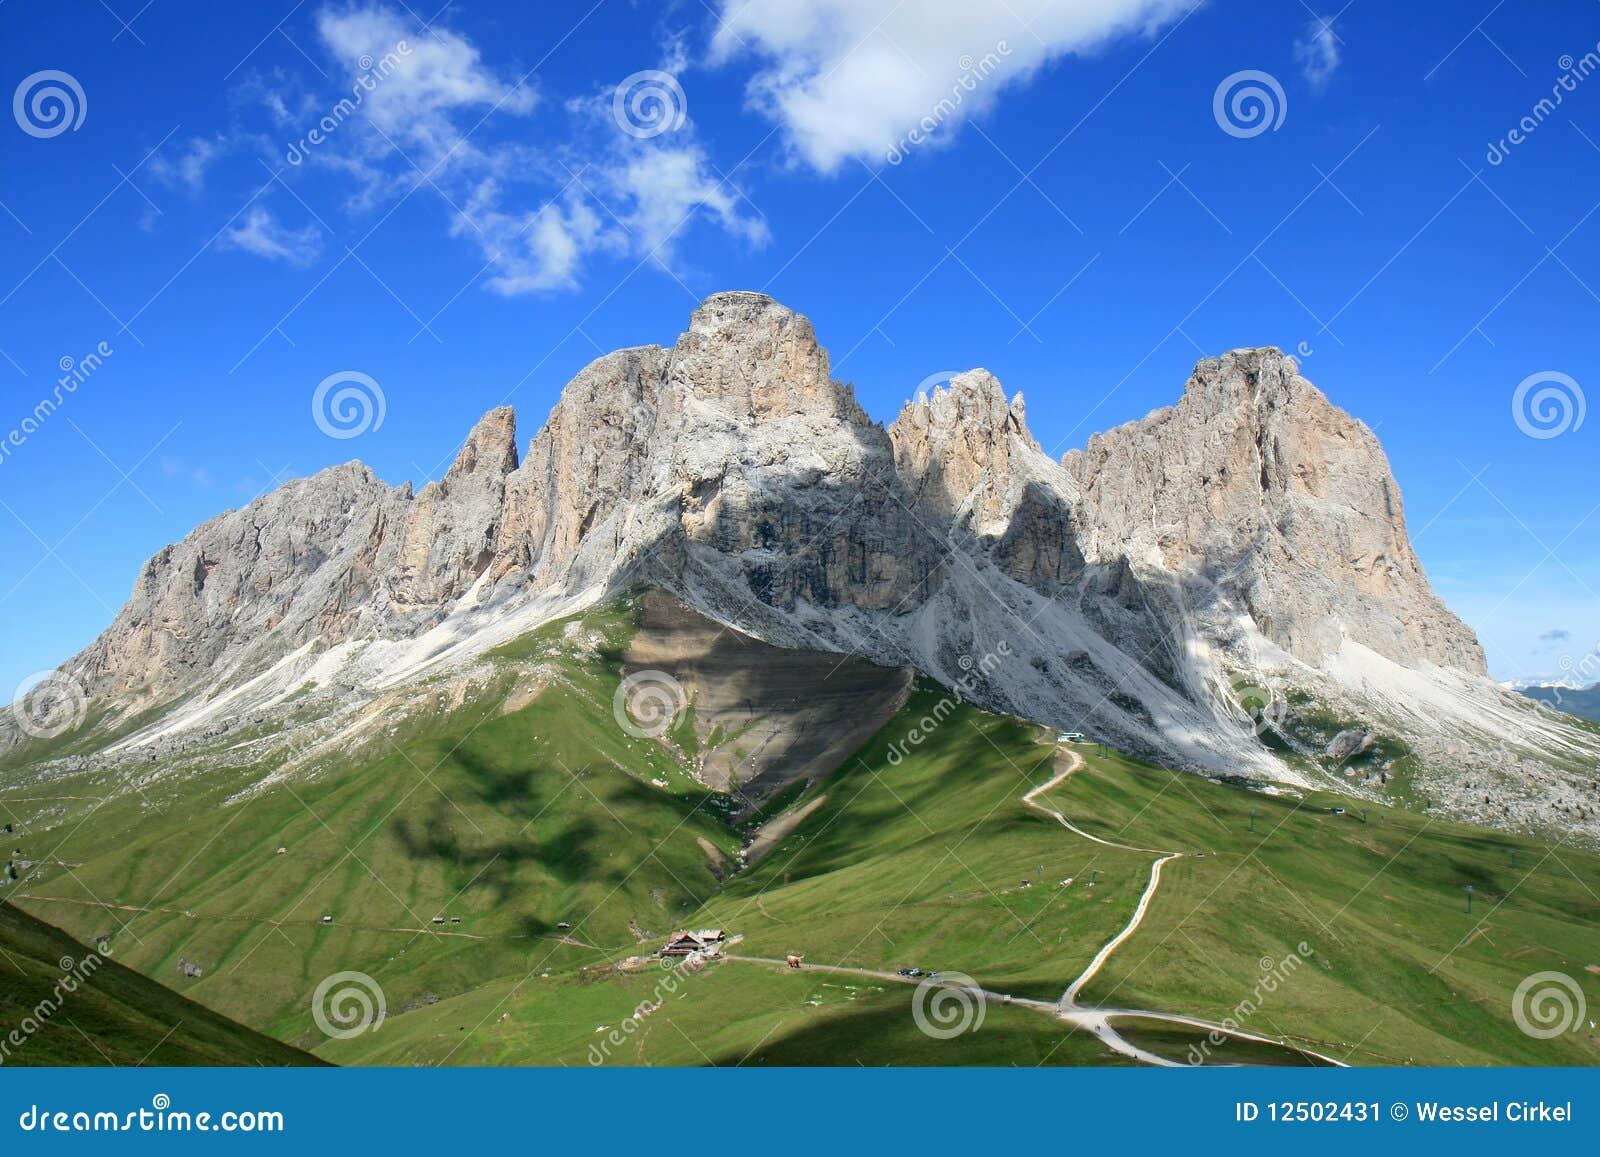 View of the Sassolungo Massif, Italian Dolomites